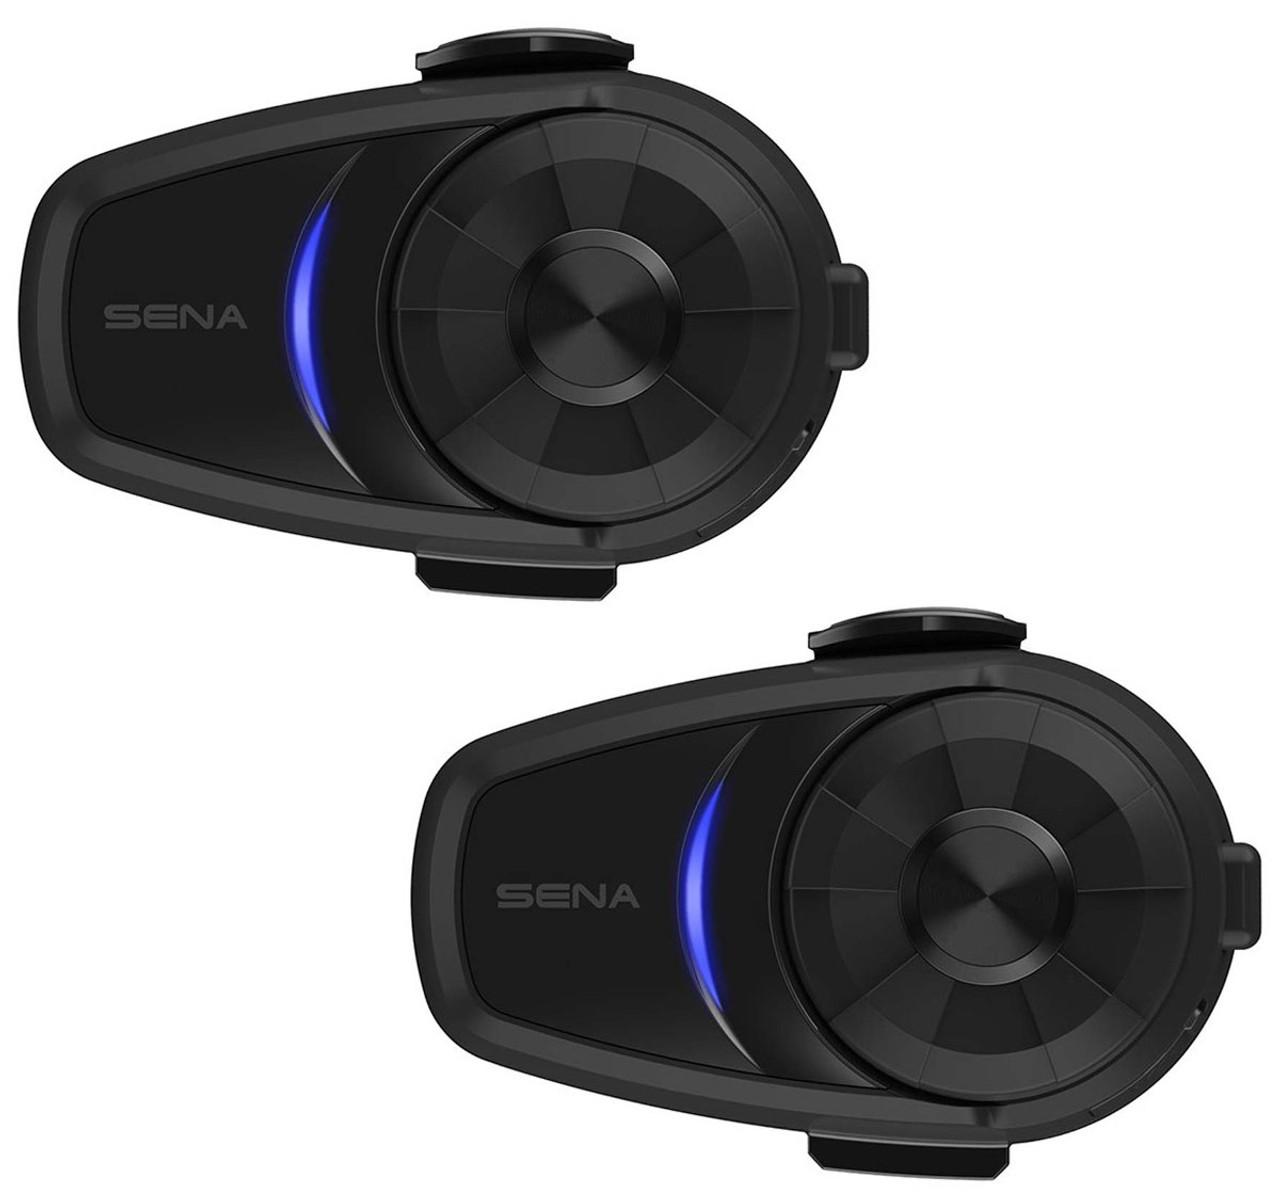 10S-01 SENA 10S Bluetooth Headset//Intercom for Scooter//Motorcycle Helmets